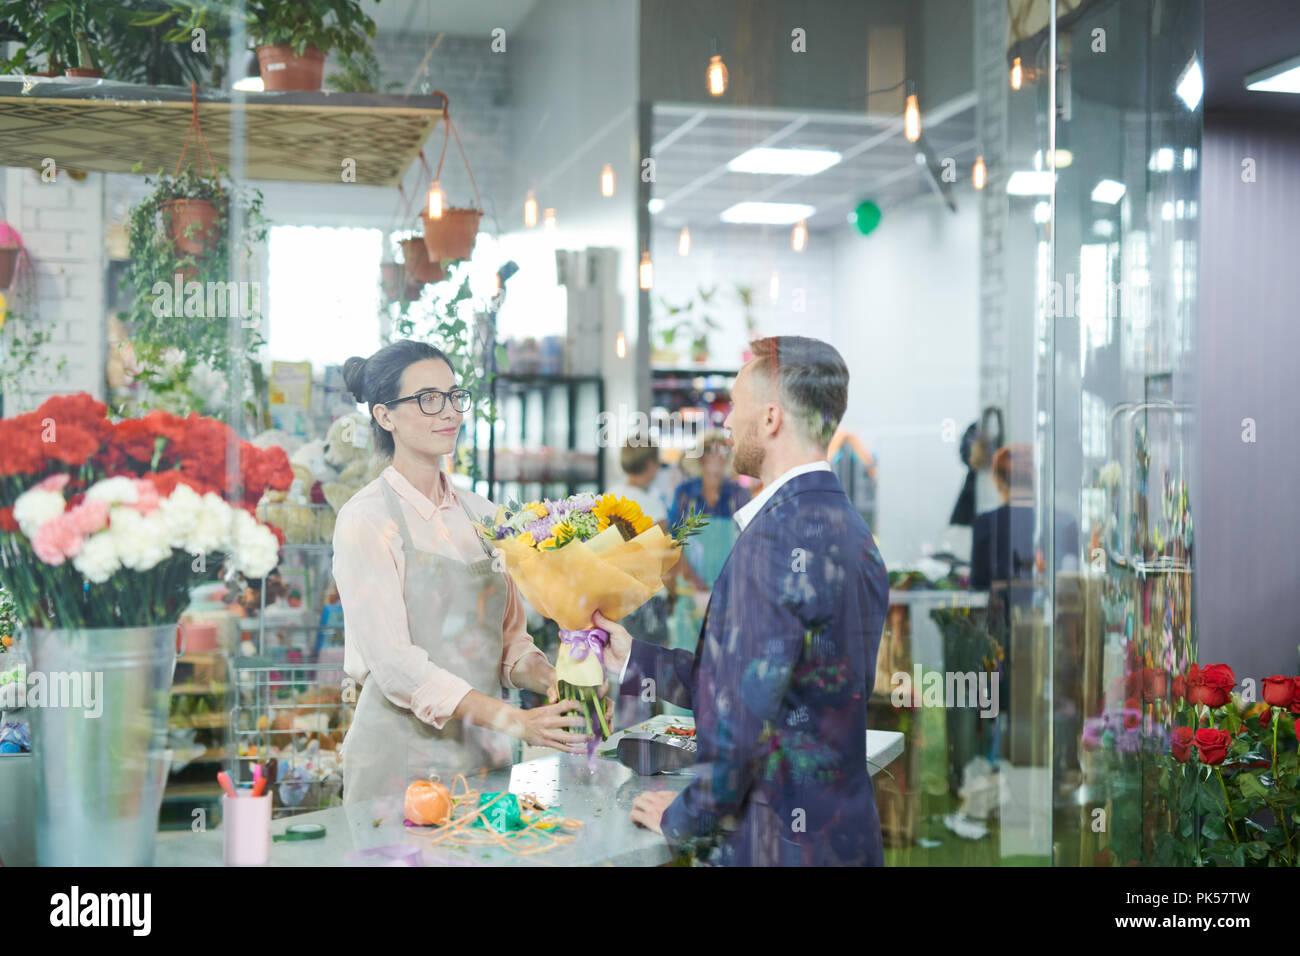 Cliente que compra flores Imagen De Stock